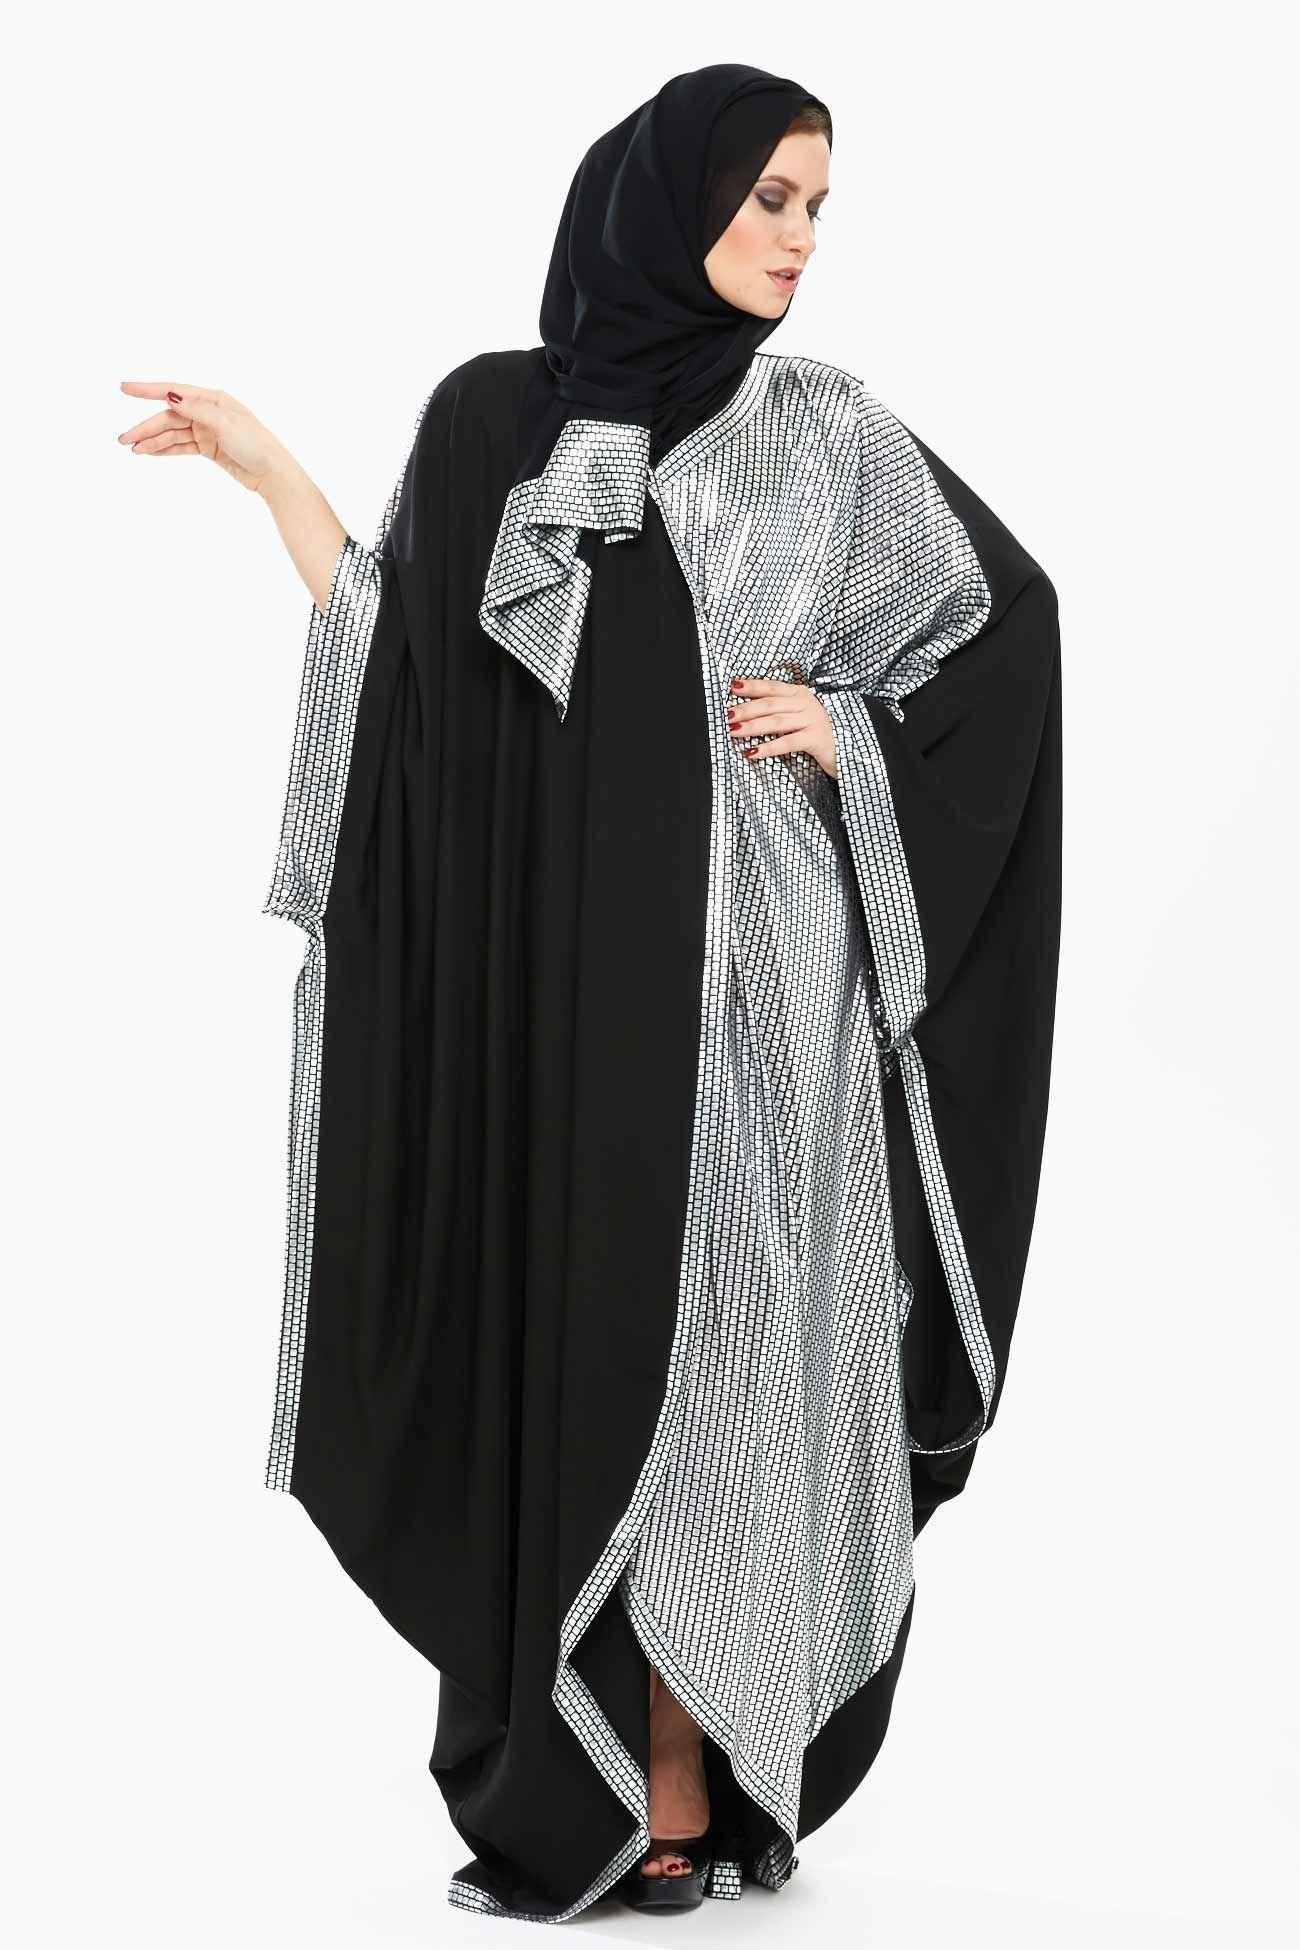 Elegant Xela Black And Silver Abaya Designed With Stylized Bat Sleeves Printed Pattern And Pleats Details It Is C Abaya Designs Abaya Fashion Hijab Fashion